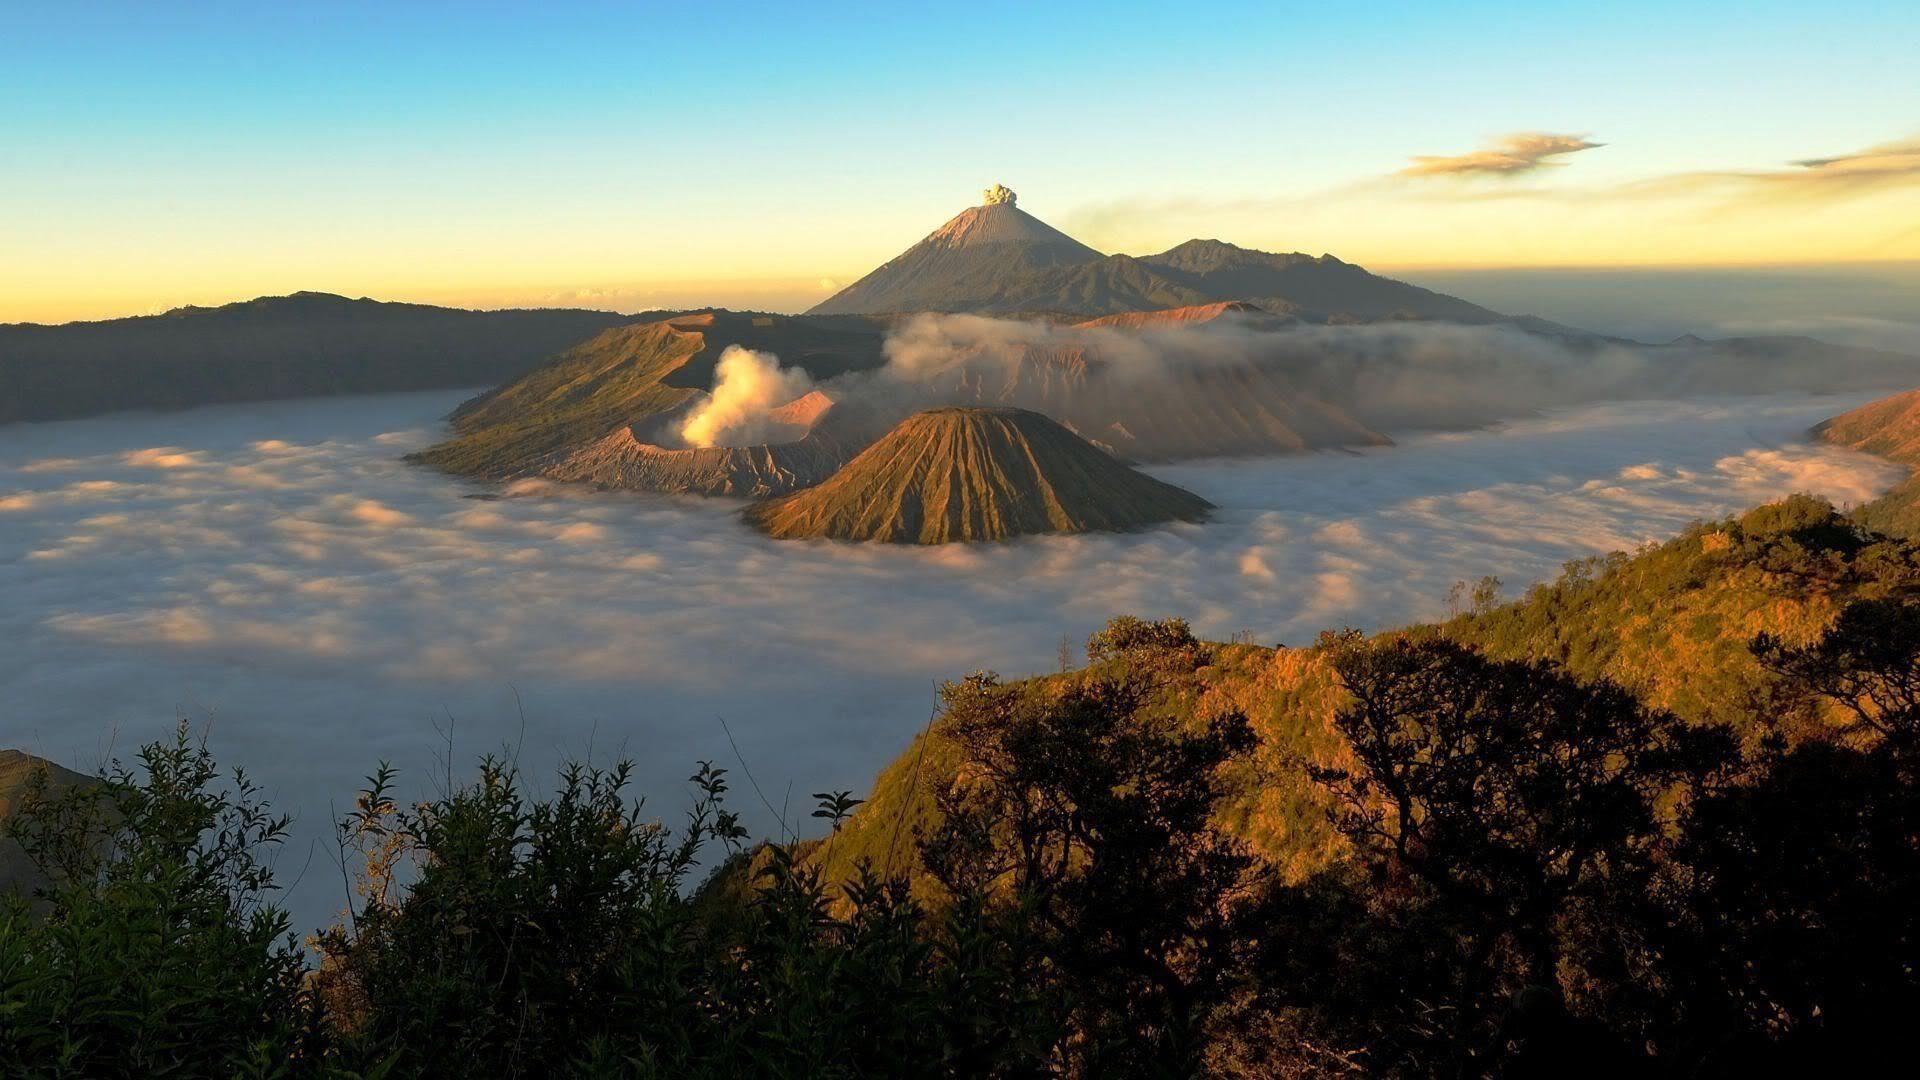 The Bromo Volcano Bali